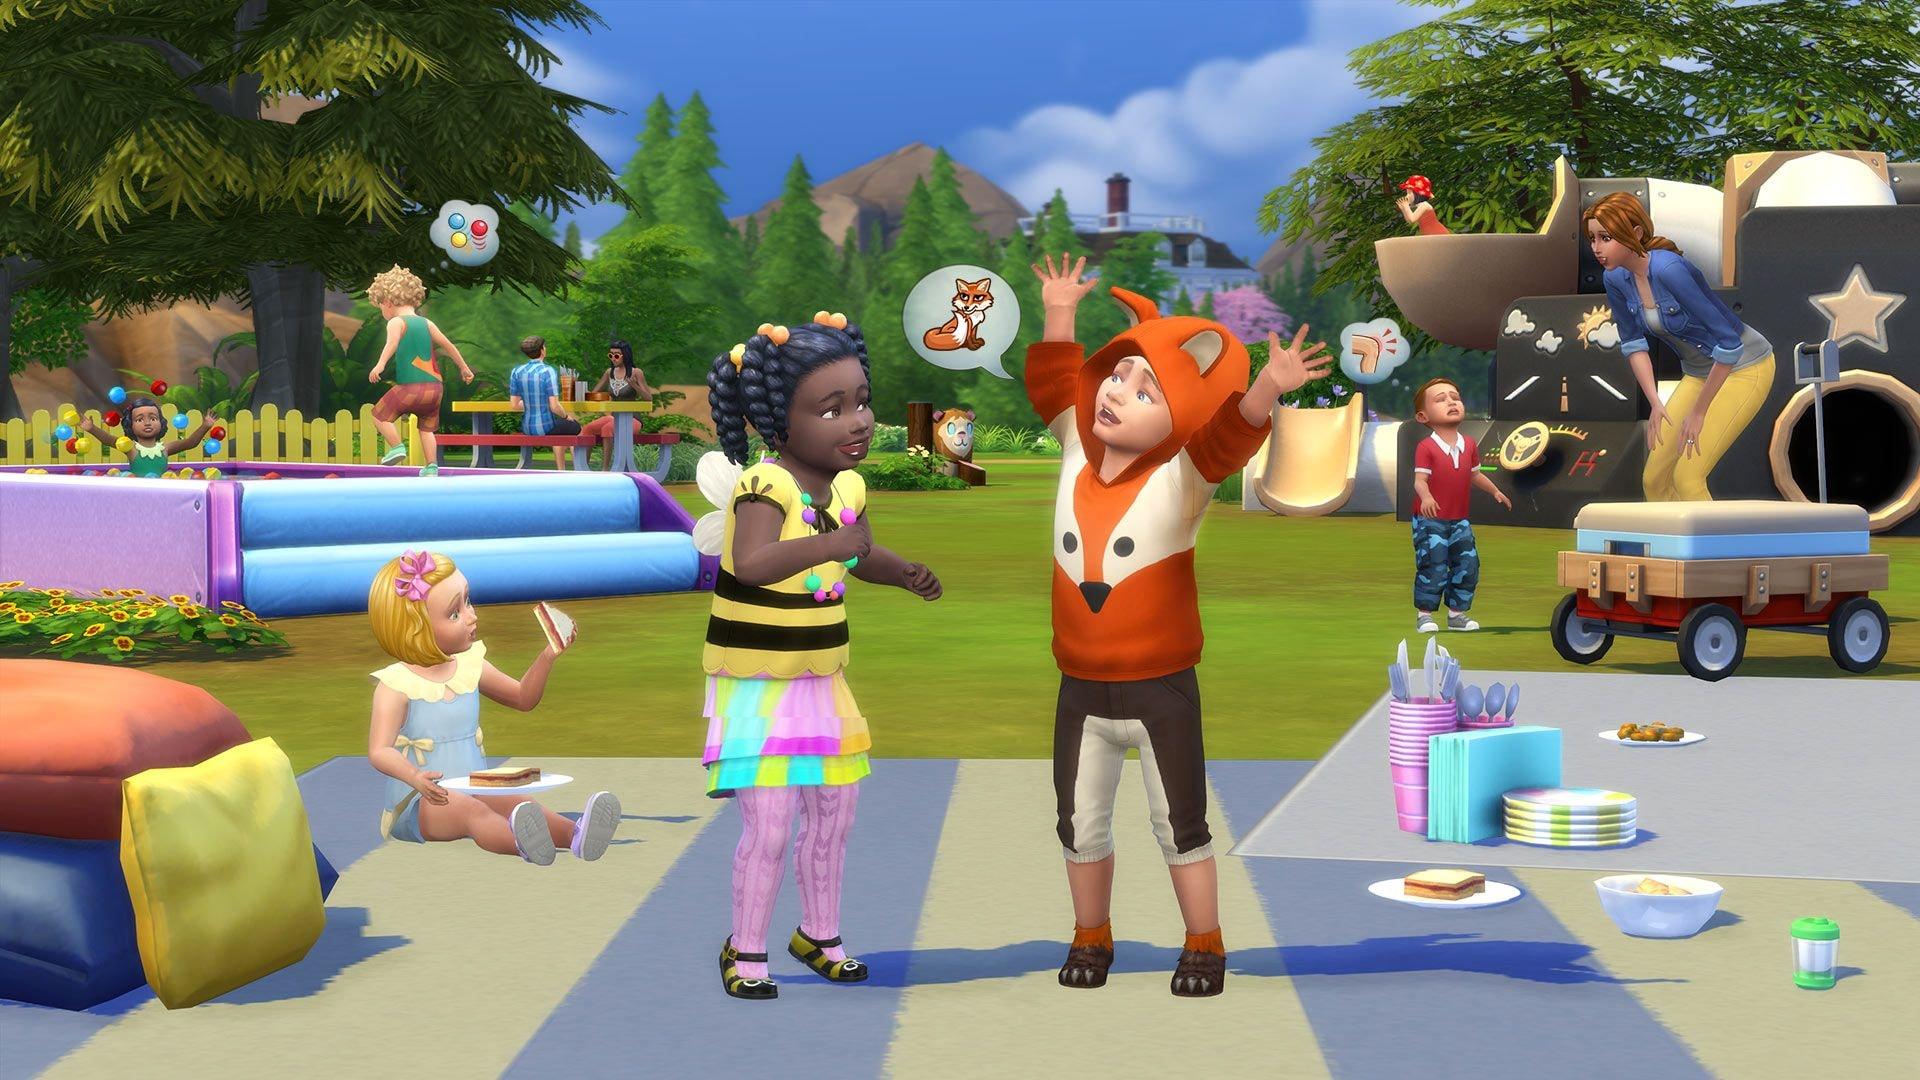 The Sims 4 Toddler Stuff DLC Origin Key GLOBAL - 2